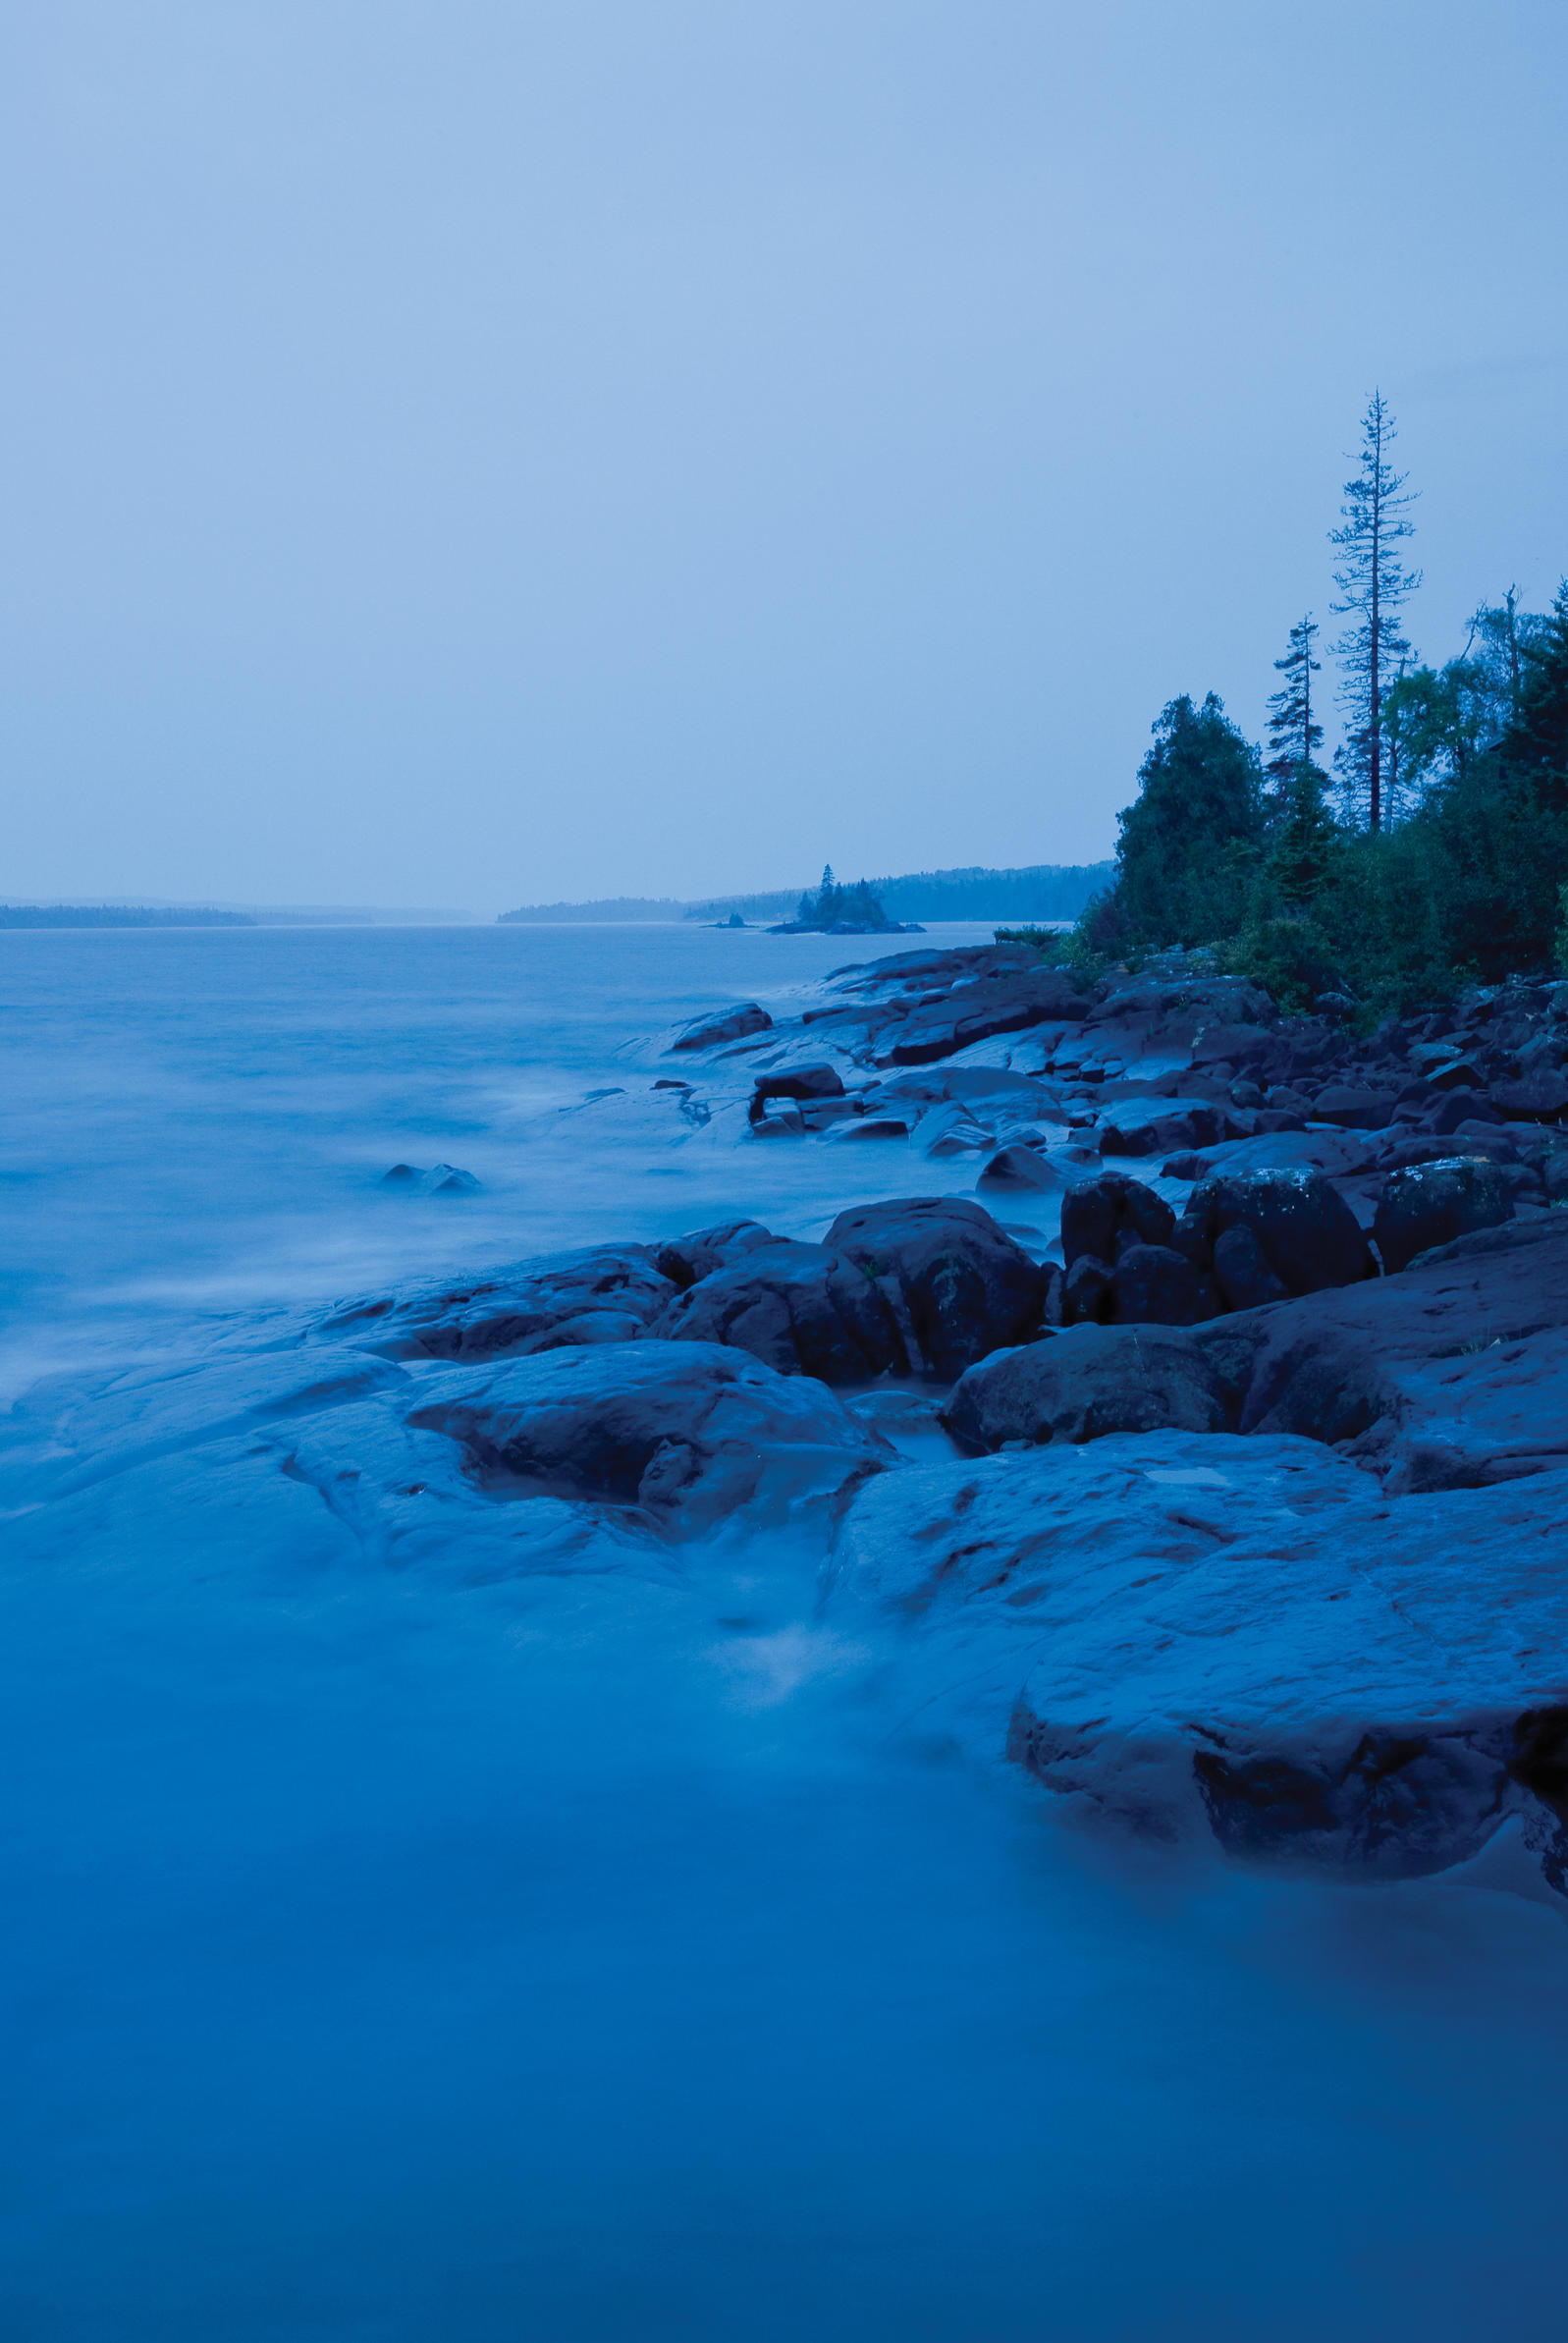 Twelve-mile-long Rock Harbor, on the island's eastern end, on a gray day in September. Per Breiehagen